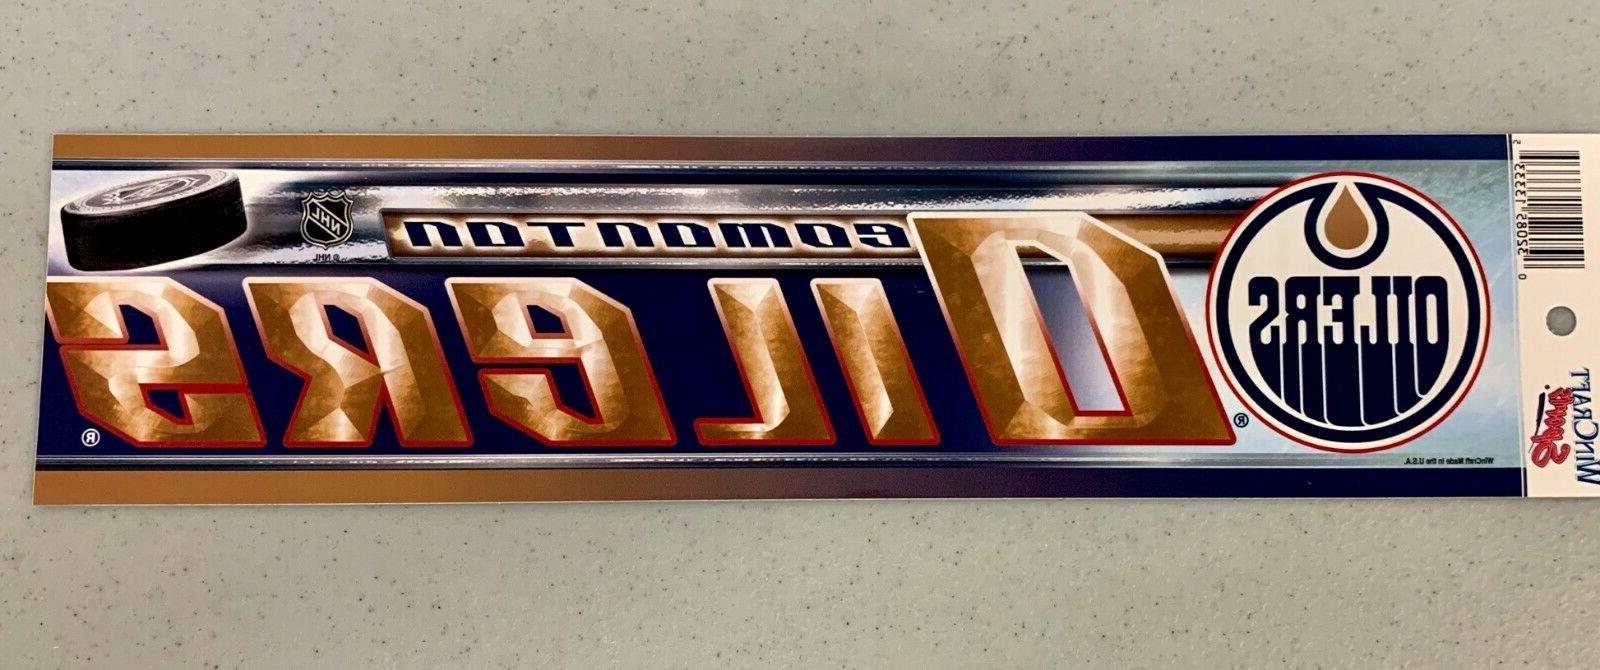 edmonton oilers vibrant official nhl team logo